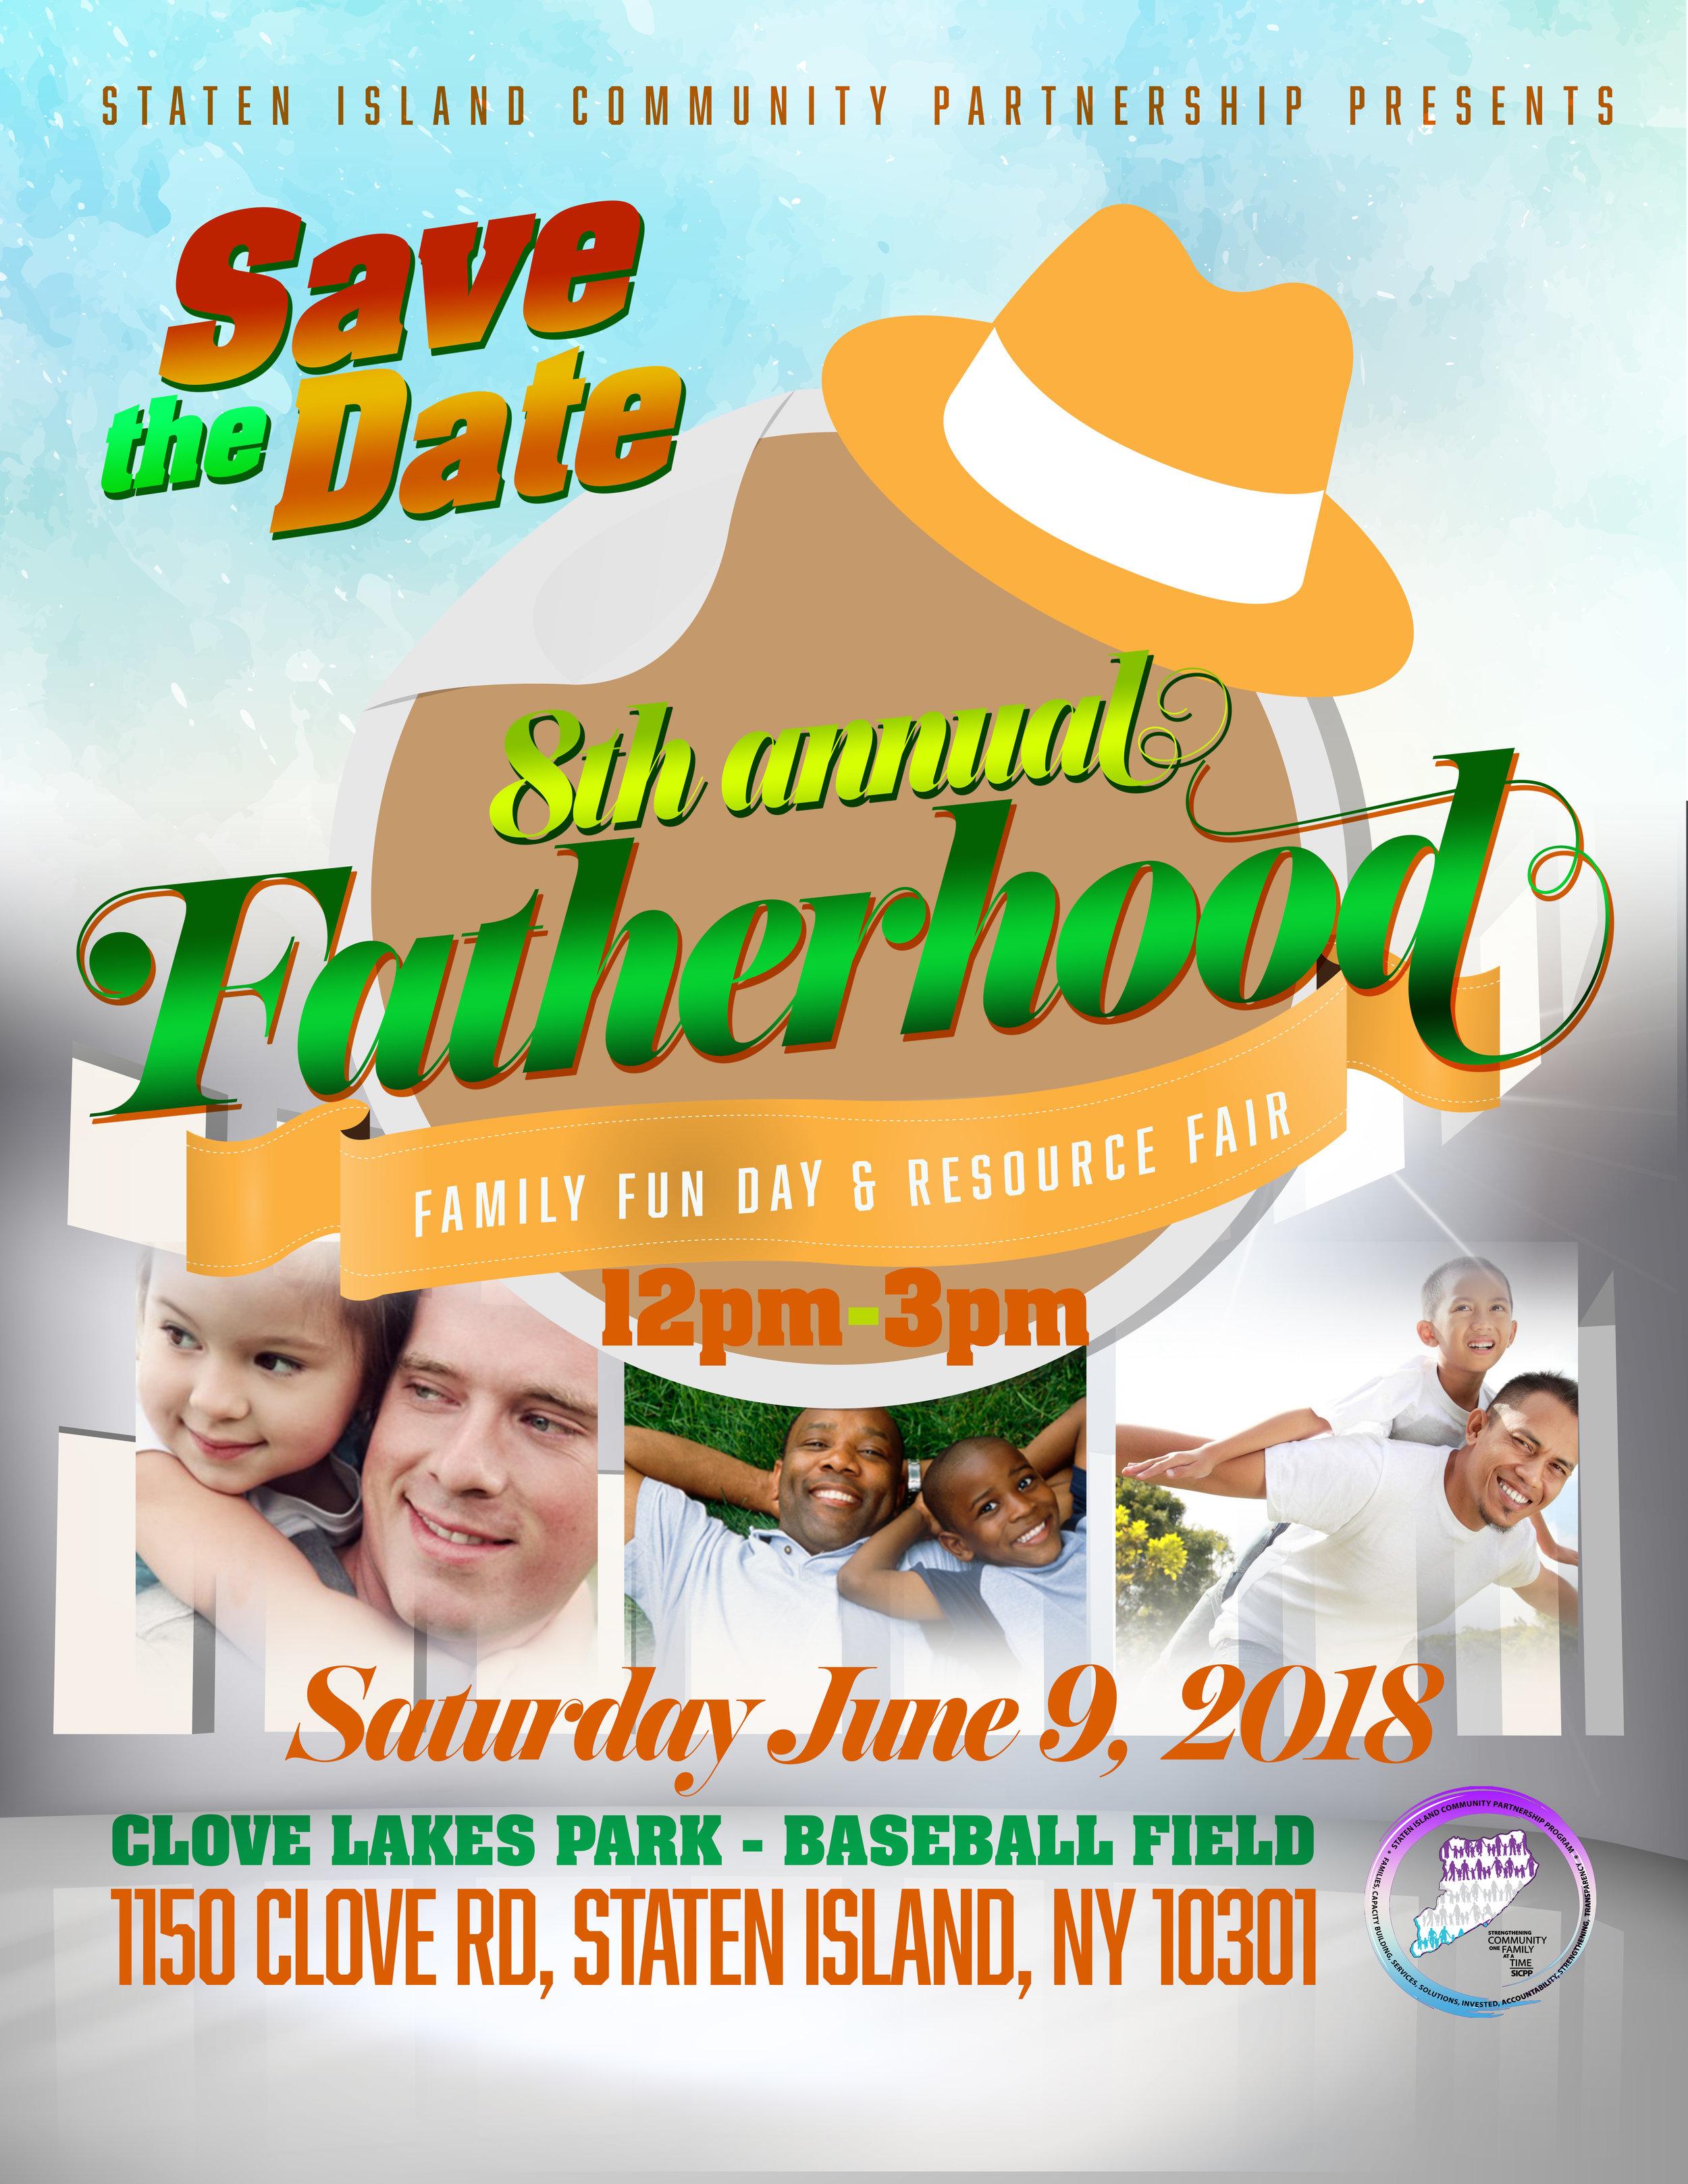 8th Annual Fatherhood-Flyer.jpg